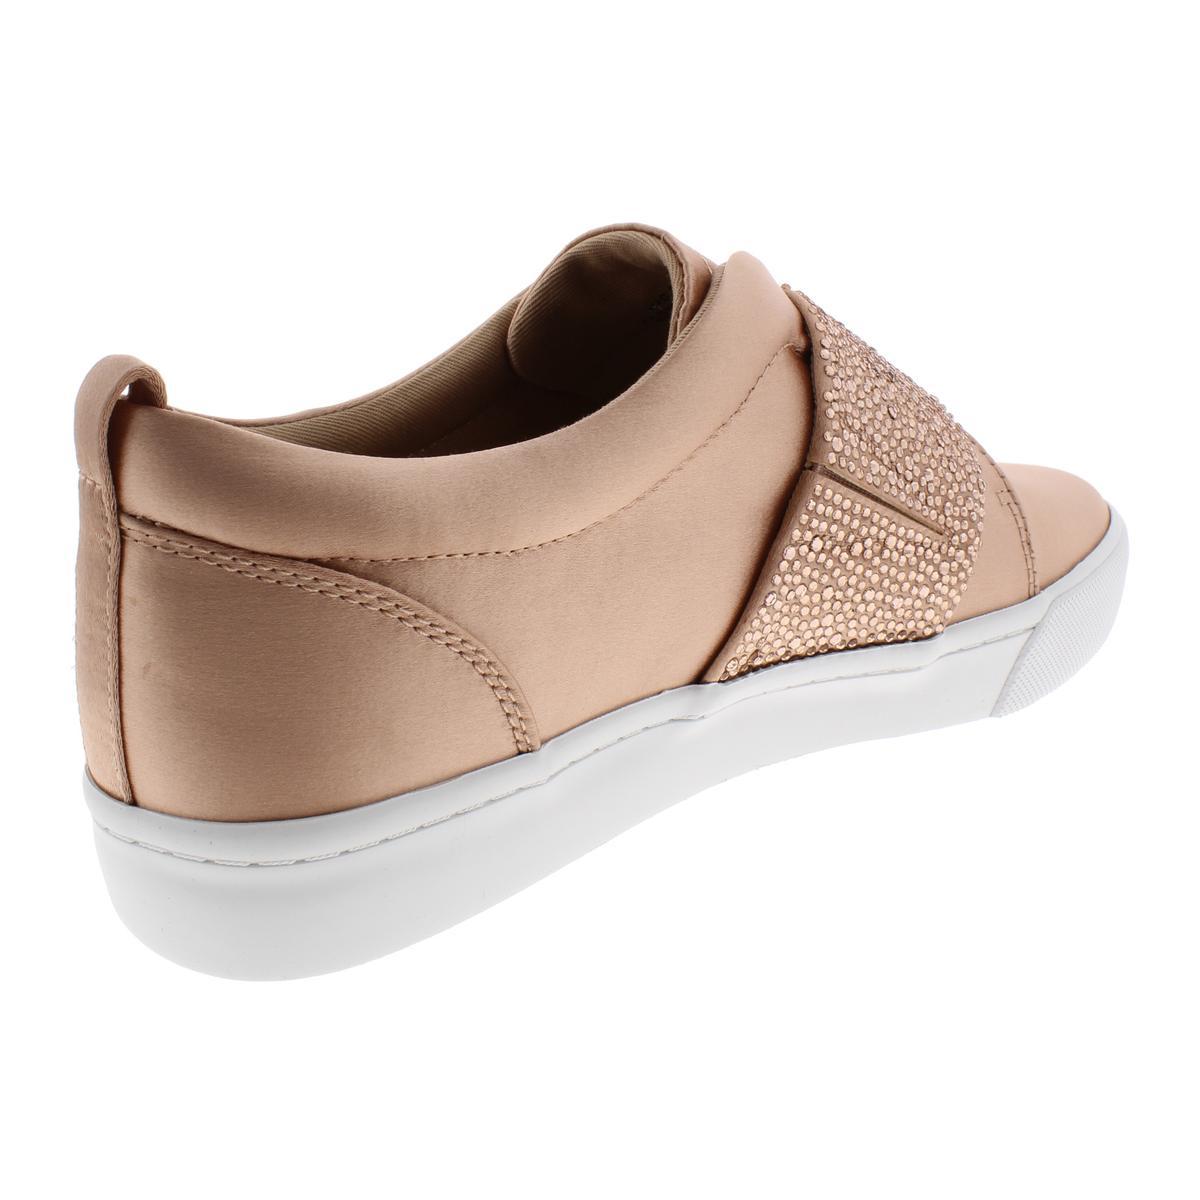 INC-Womens-Sapphira-Padded-Insole-Rhinestone-Casual-Shoes-Sneakers-BHFO-8988 thumbnail 6